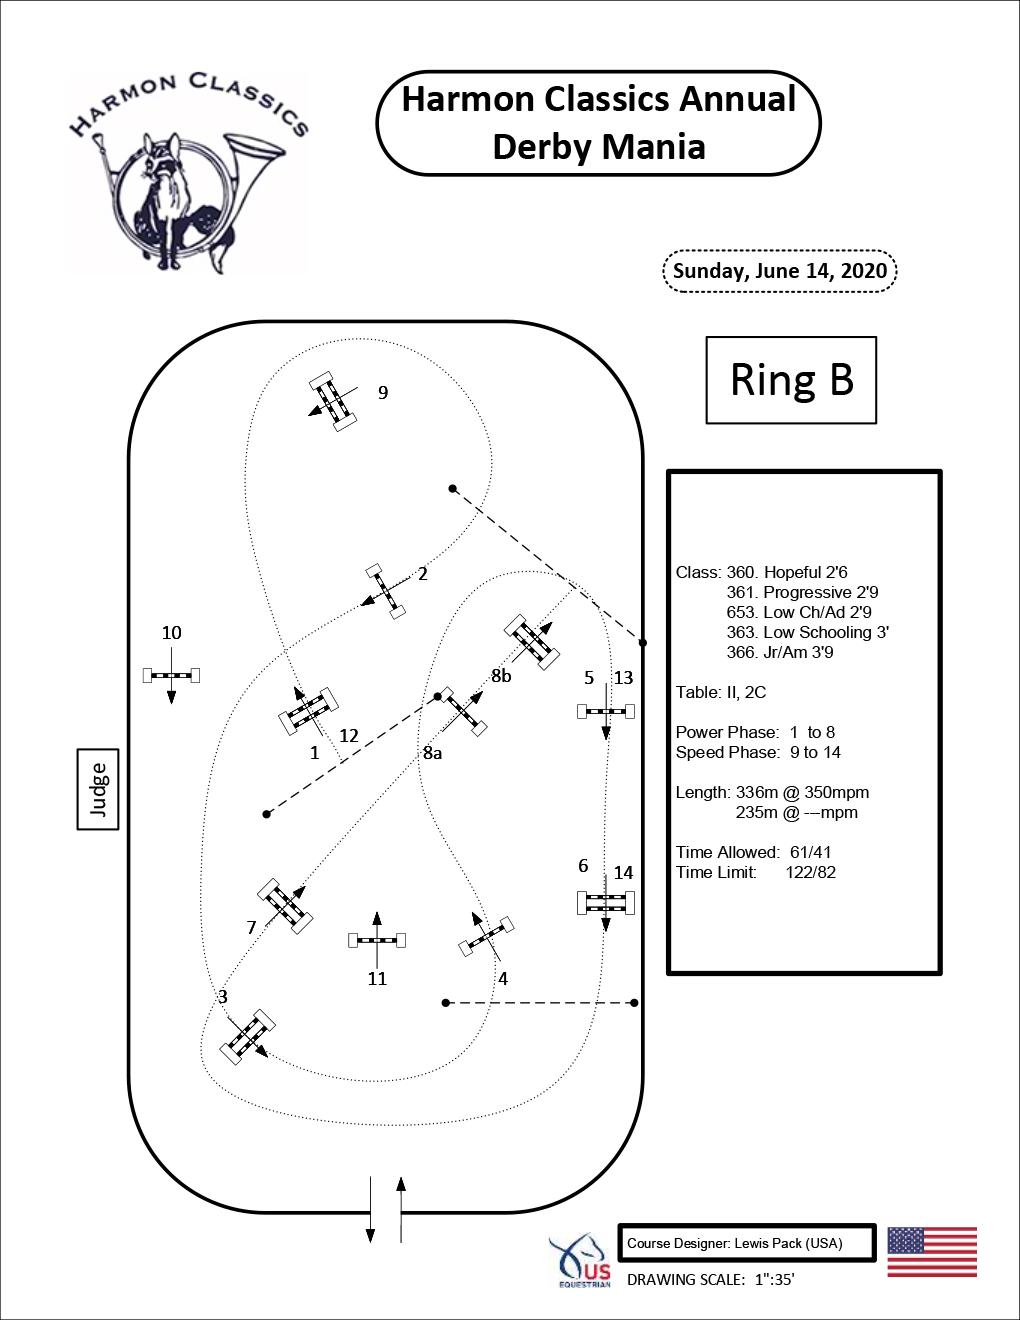 Ring-B-Sunday6-14-Table-II-2-C-Harmon-Classics-Derby-Mania